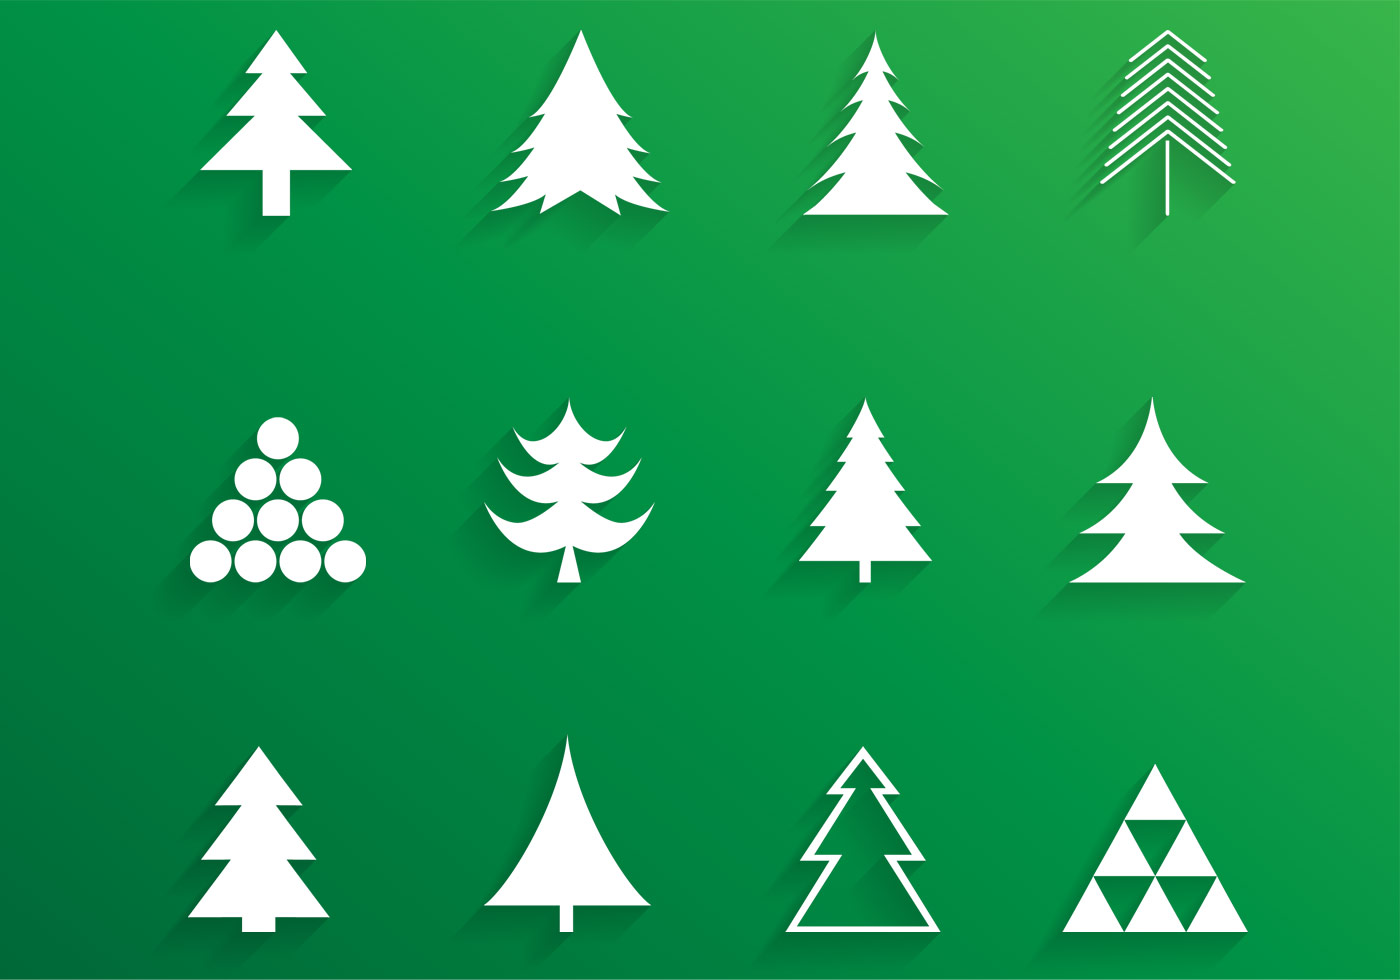 Simple Christmas Tree Vector Pack - Download Free Vectors ...